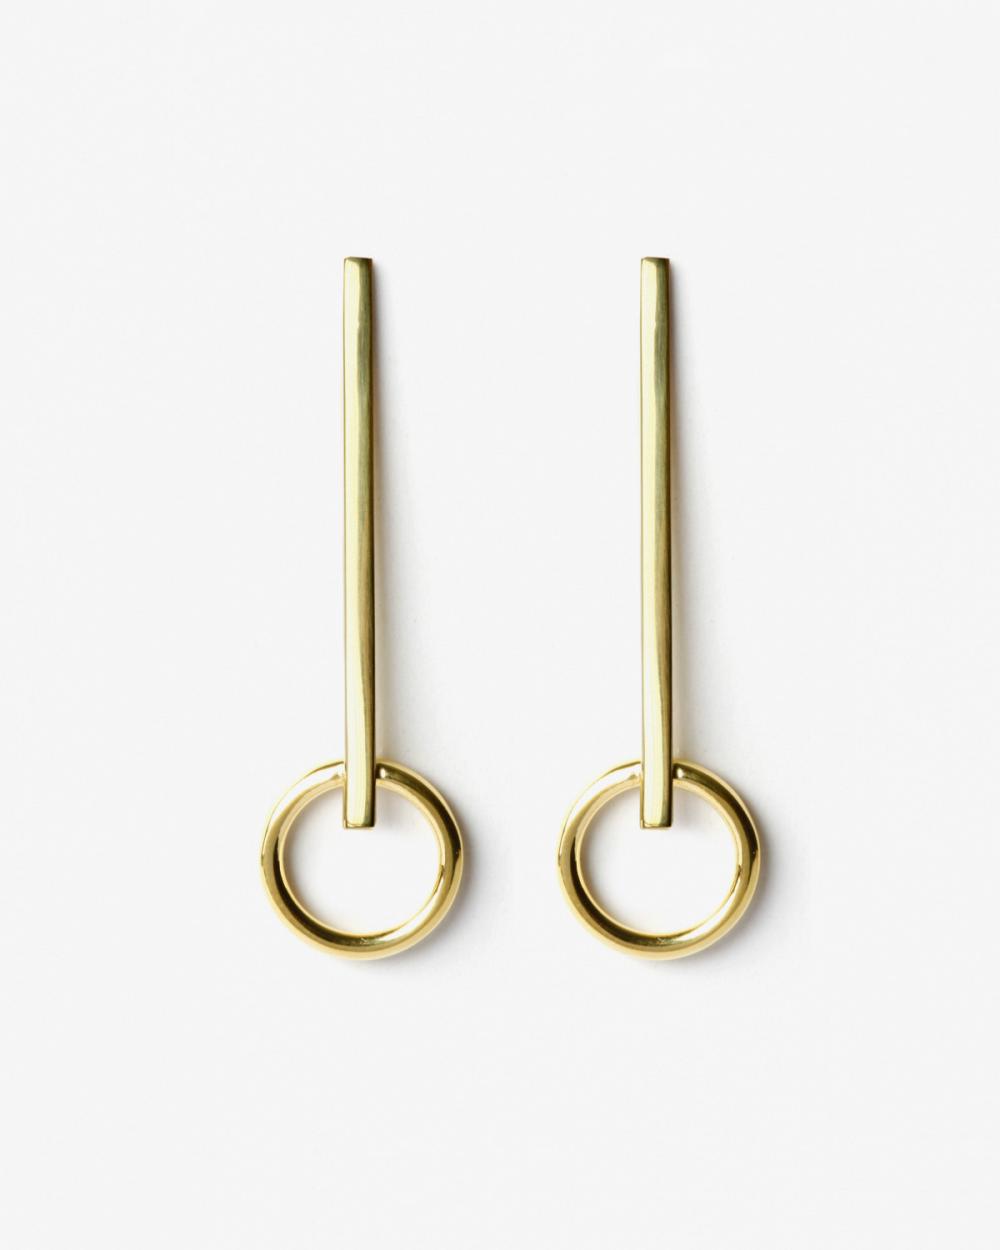 Earrings YELLOW GOLD IOTA EARRINGS NOVE25